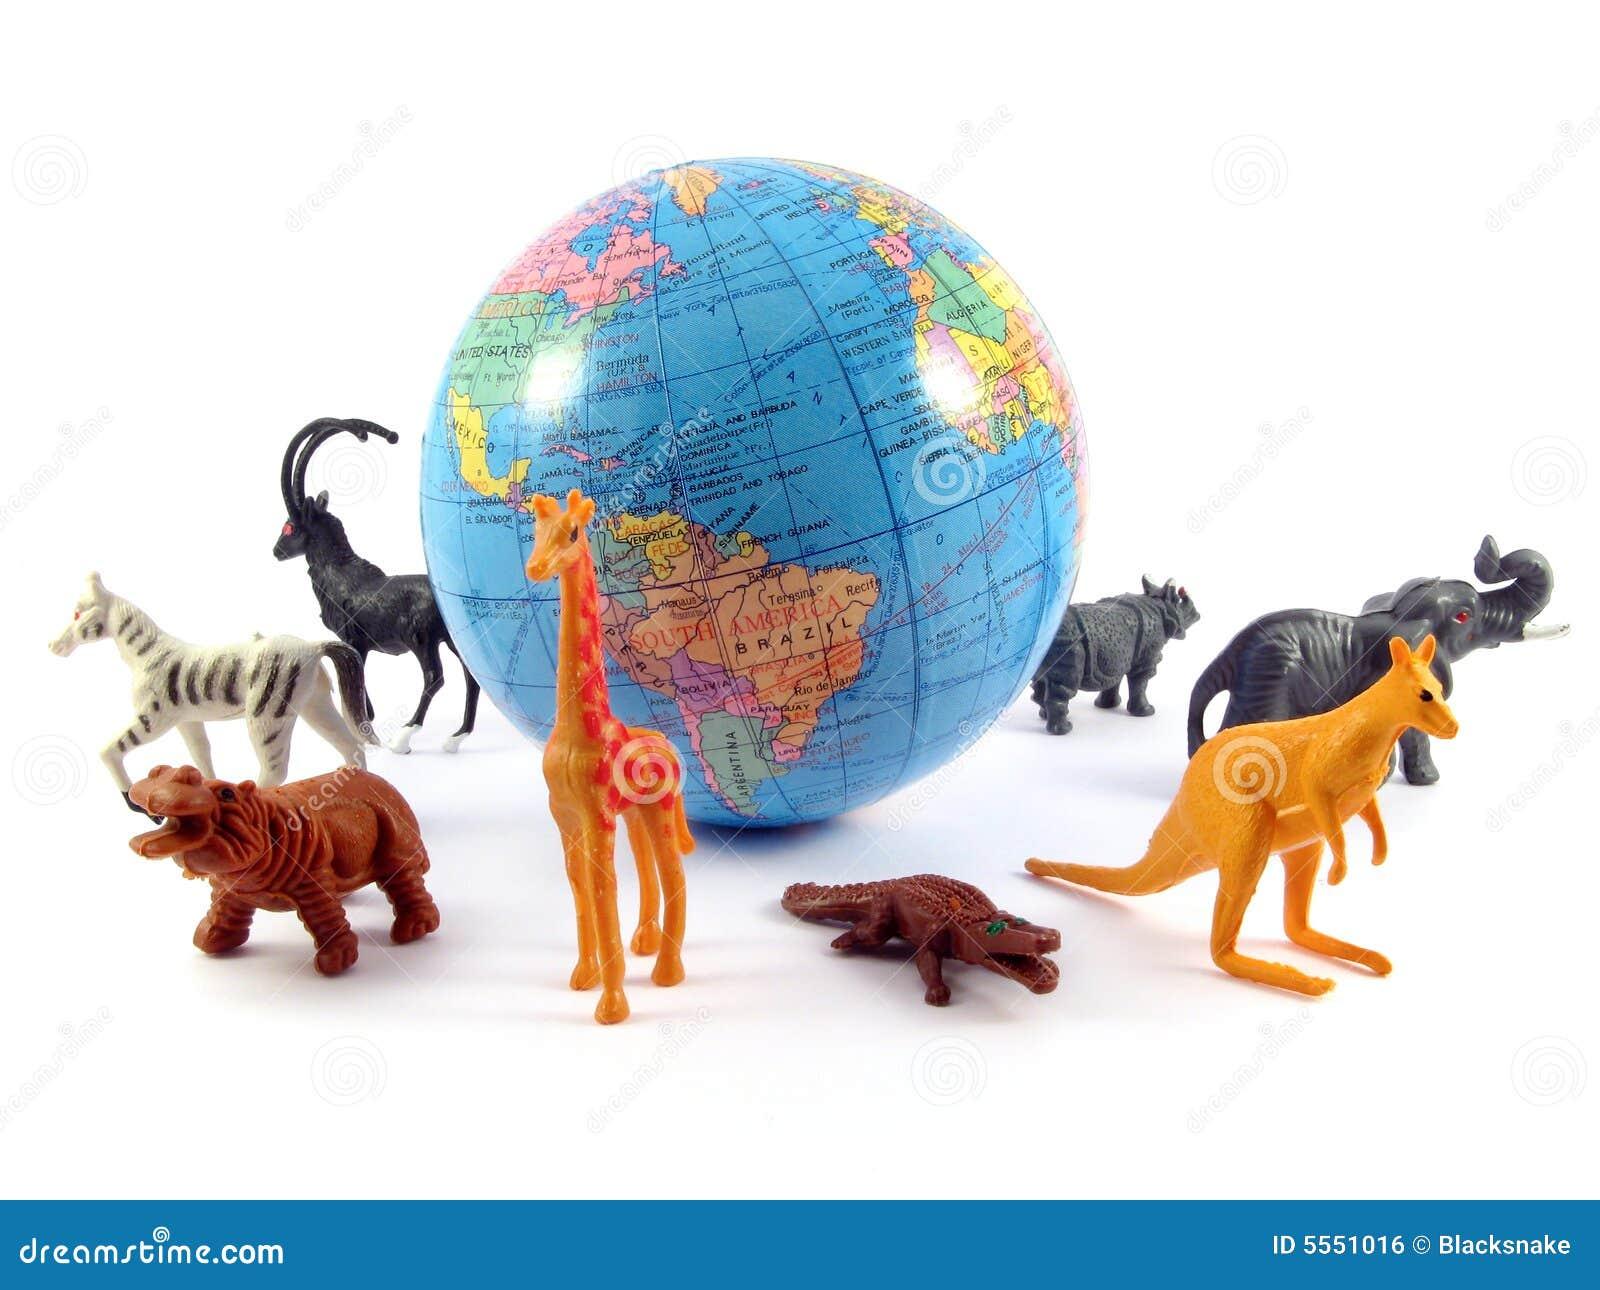 planet earth animals - photo #18